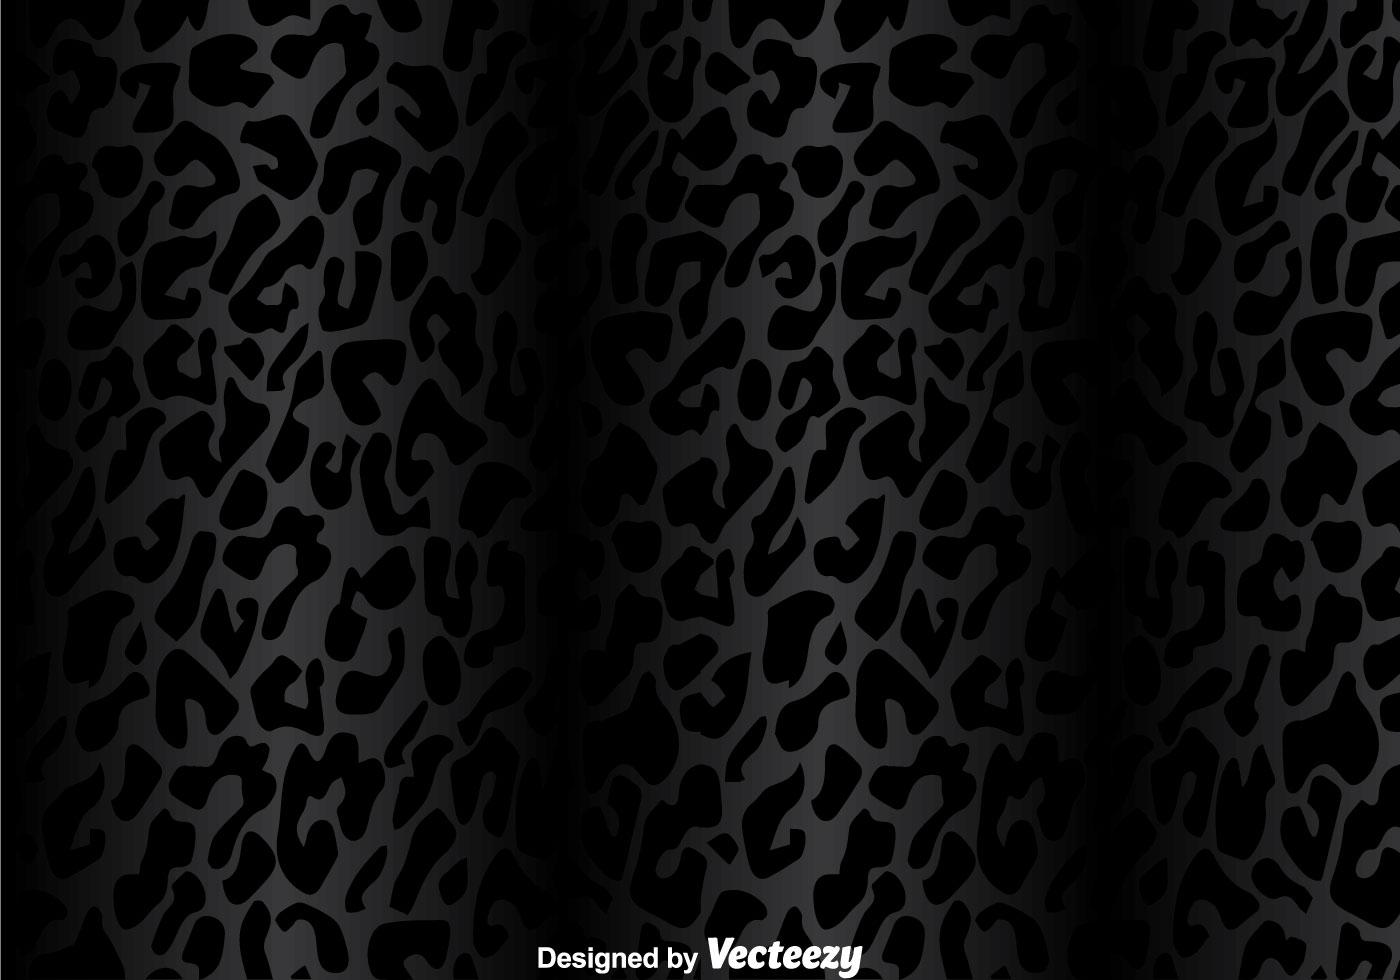 Silver Animal Print Wallpaper Black Leopard Pattern Download Free Vector Art Stock